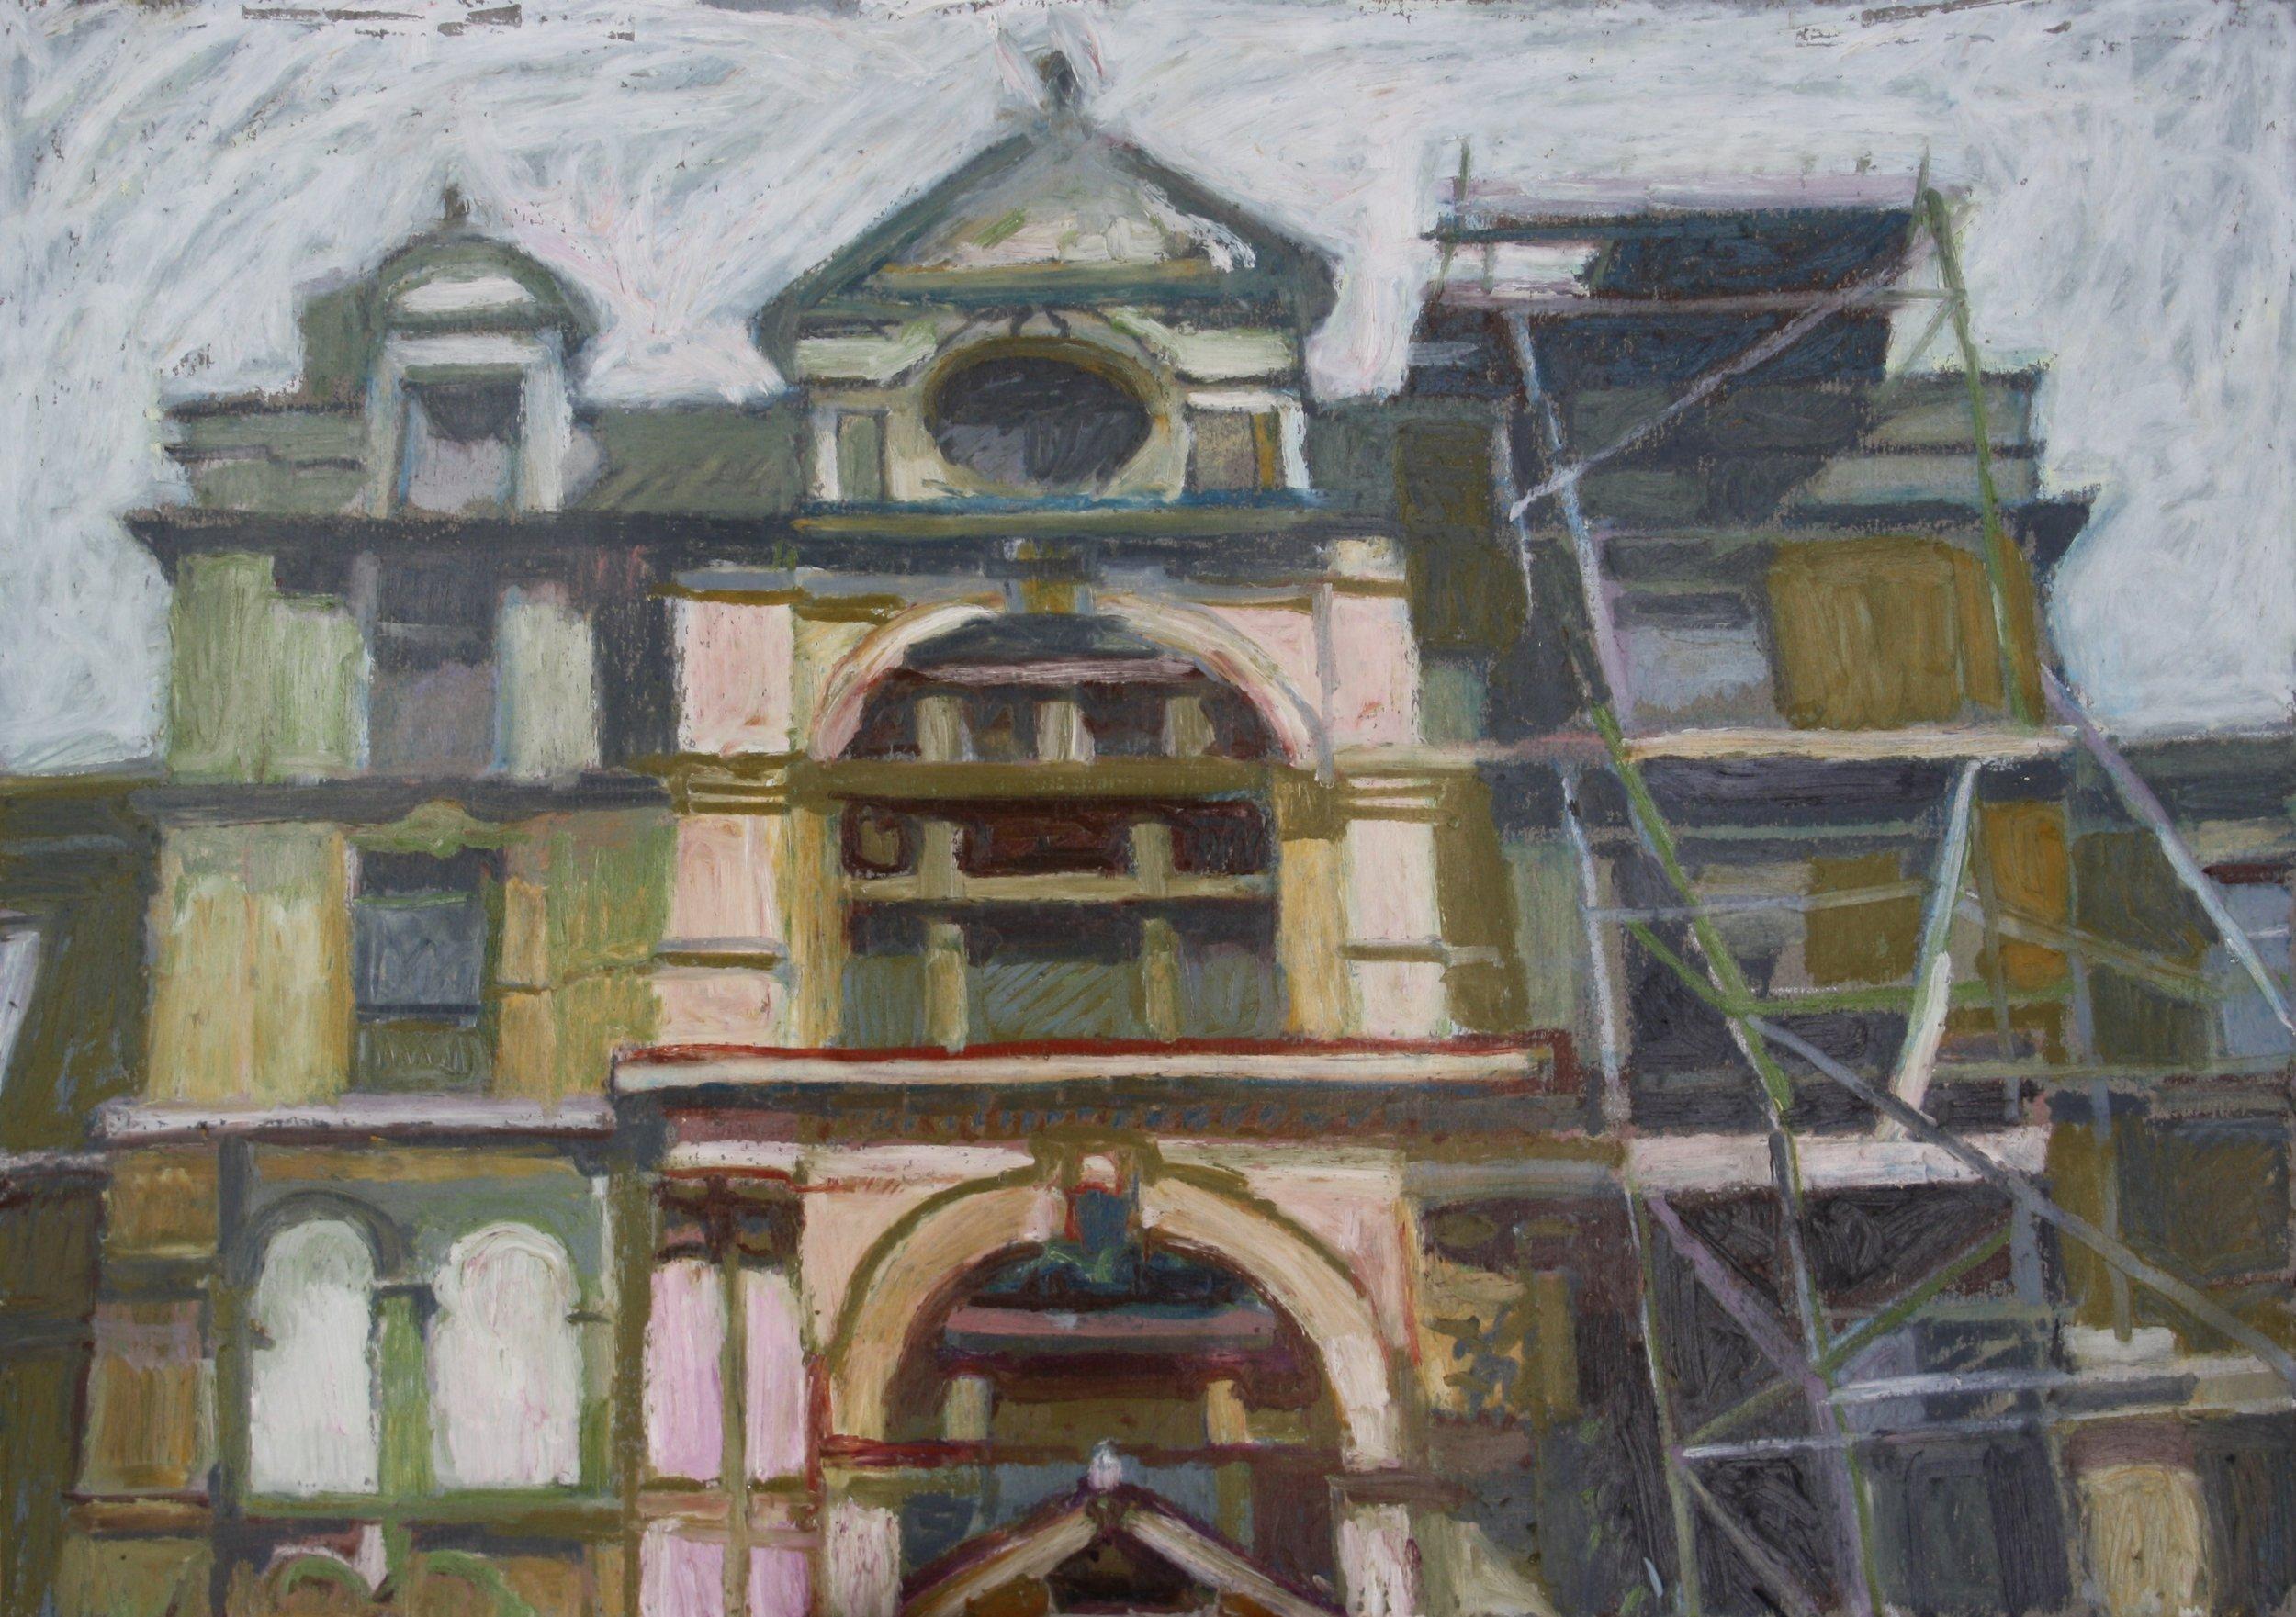 Sebastian Aplin, Coal Exchange east entrance, Oil pastel on paper, 30 x 42 x 3 cm,  http://www.sebastianaplin.com